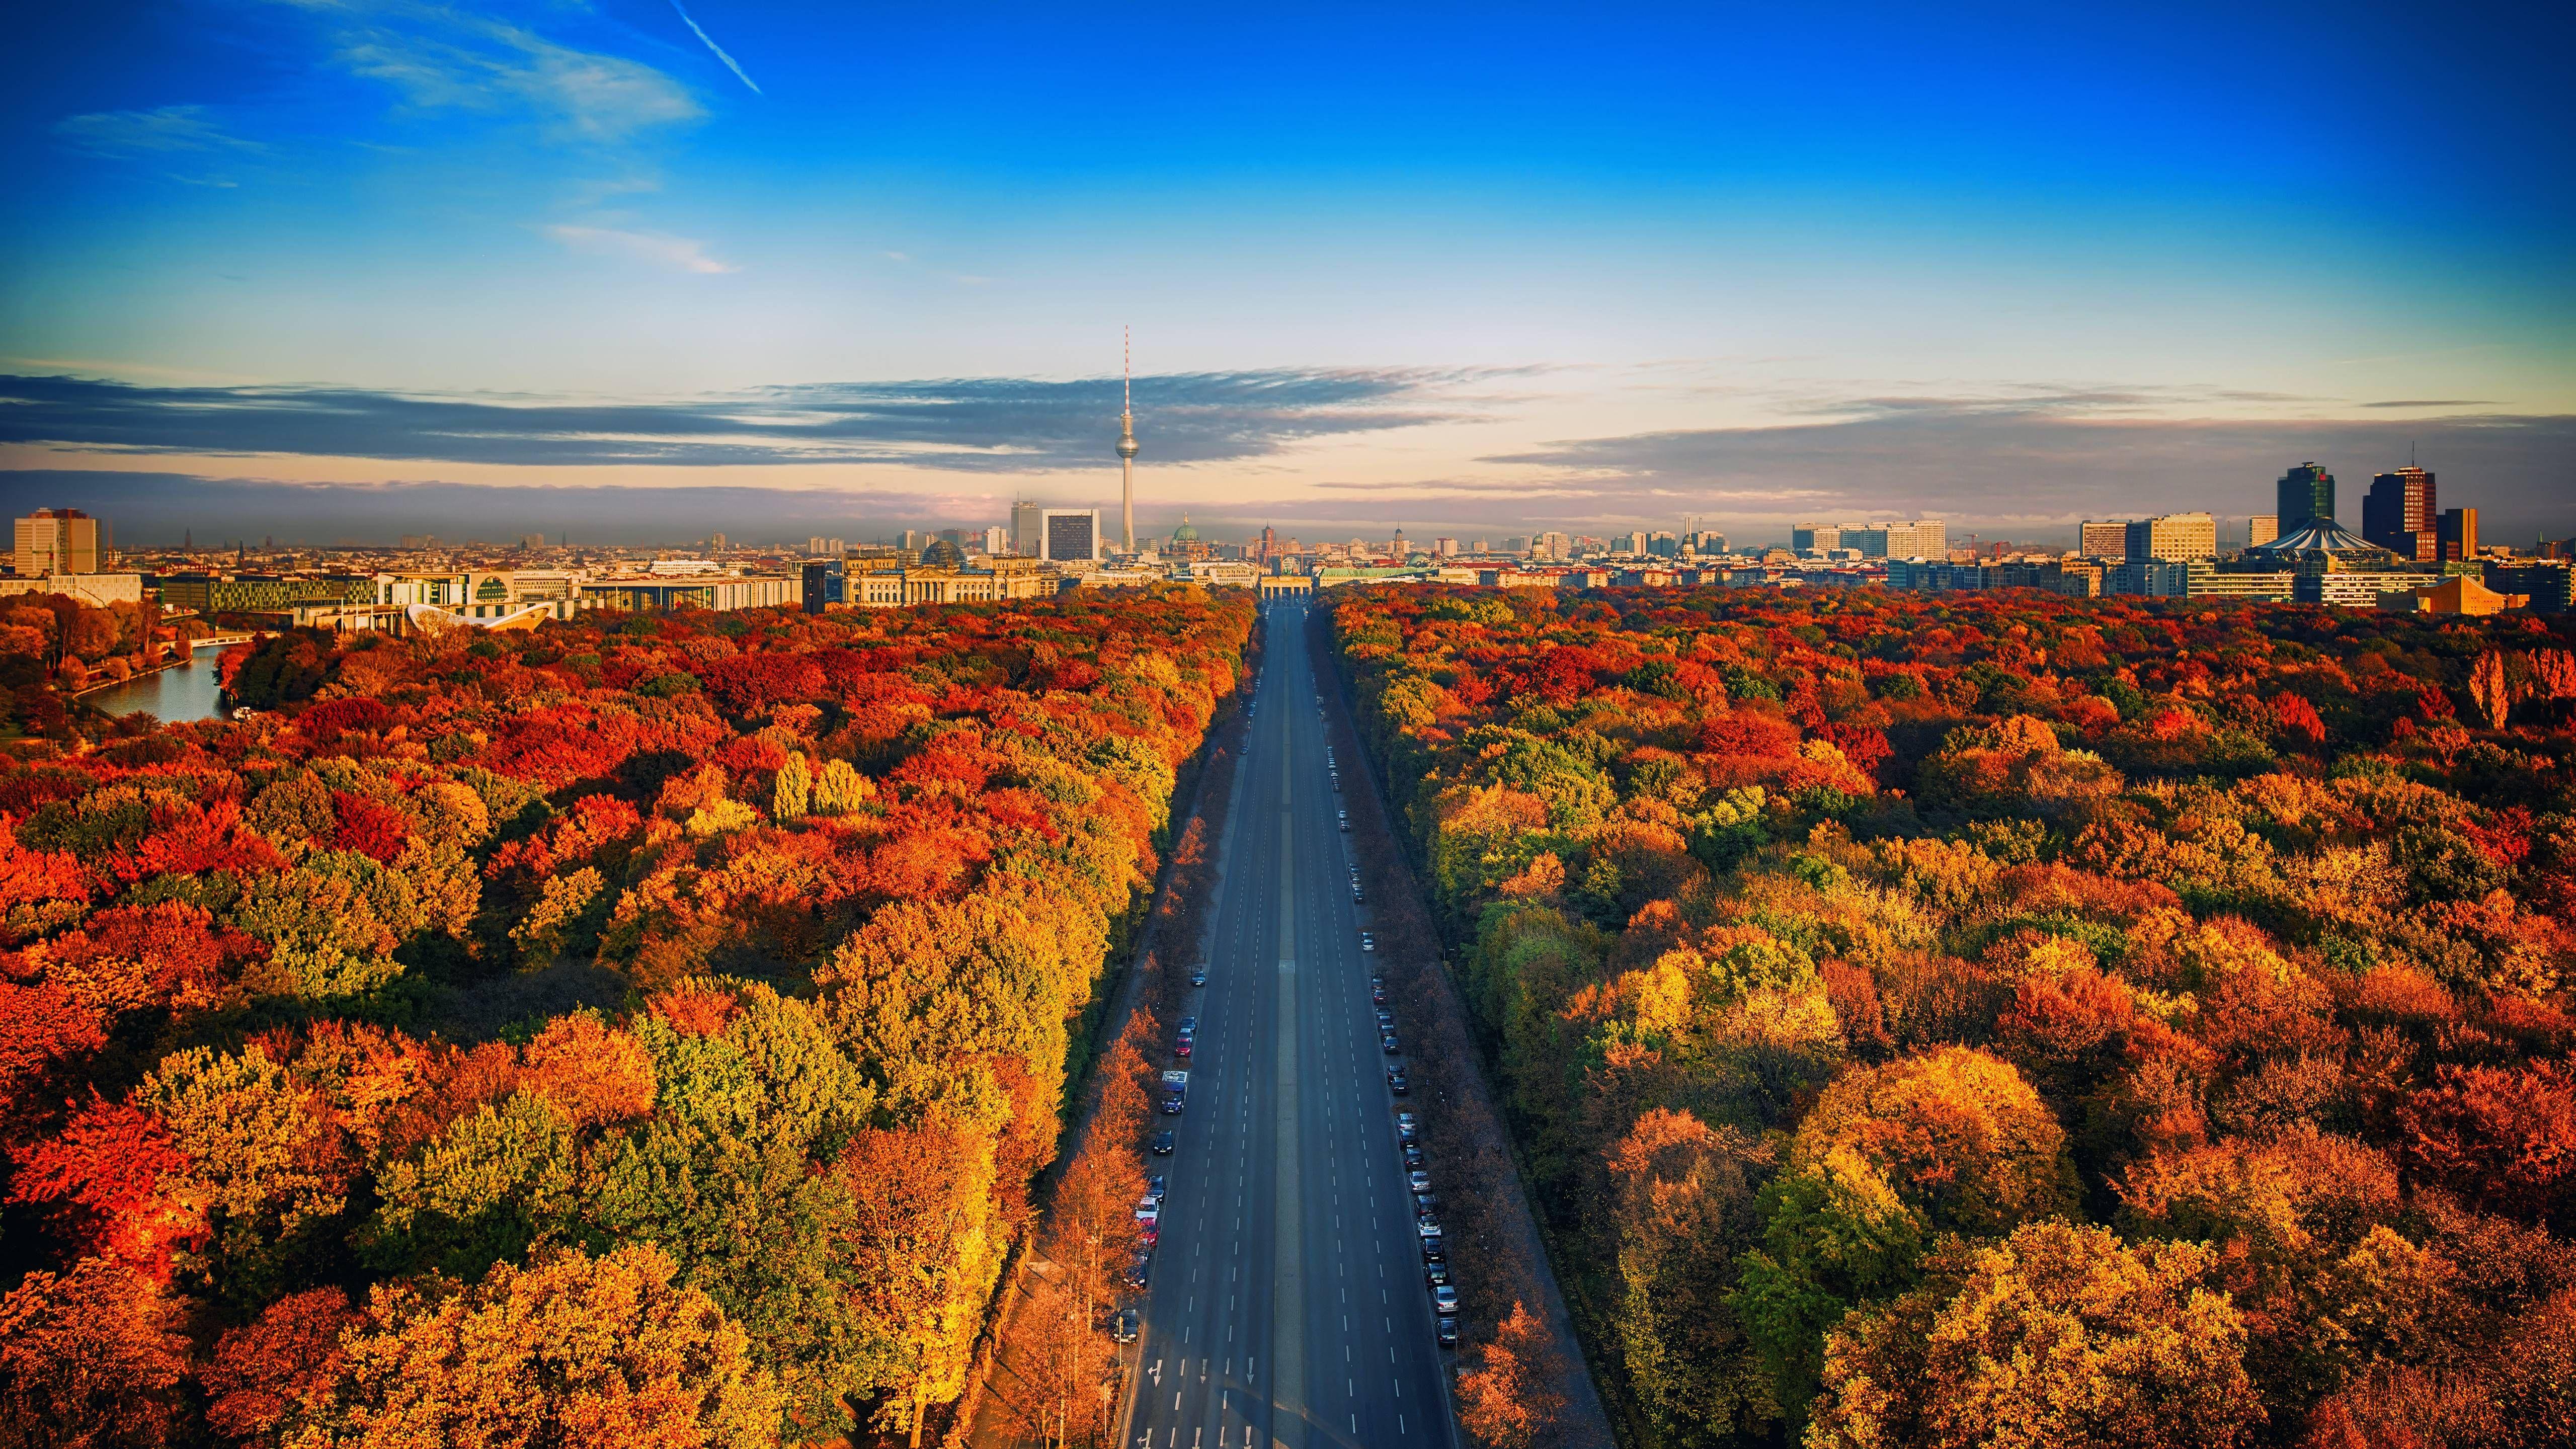 Autumn HD Wallpaper [5120 x 2880] WALLPAPERS Cityscape 5120x2880